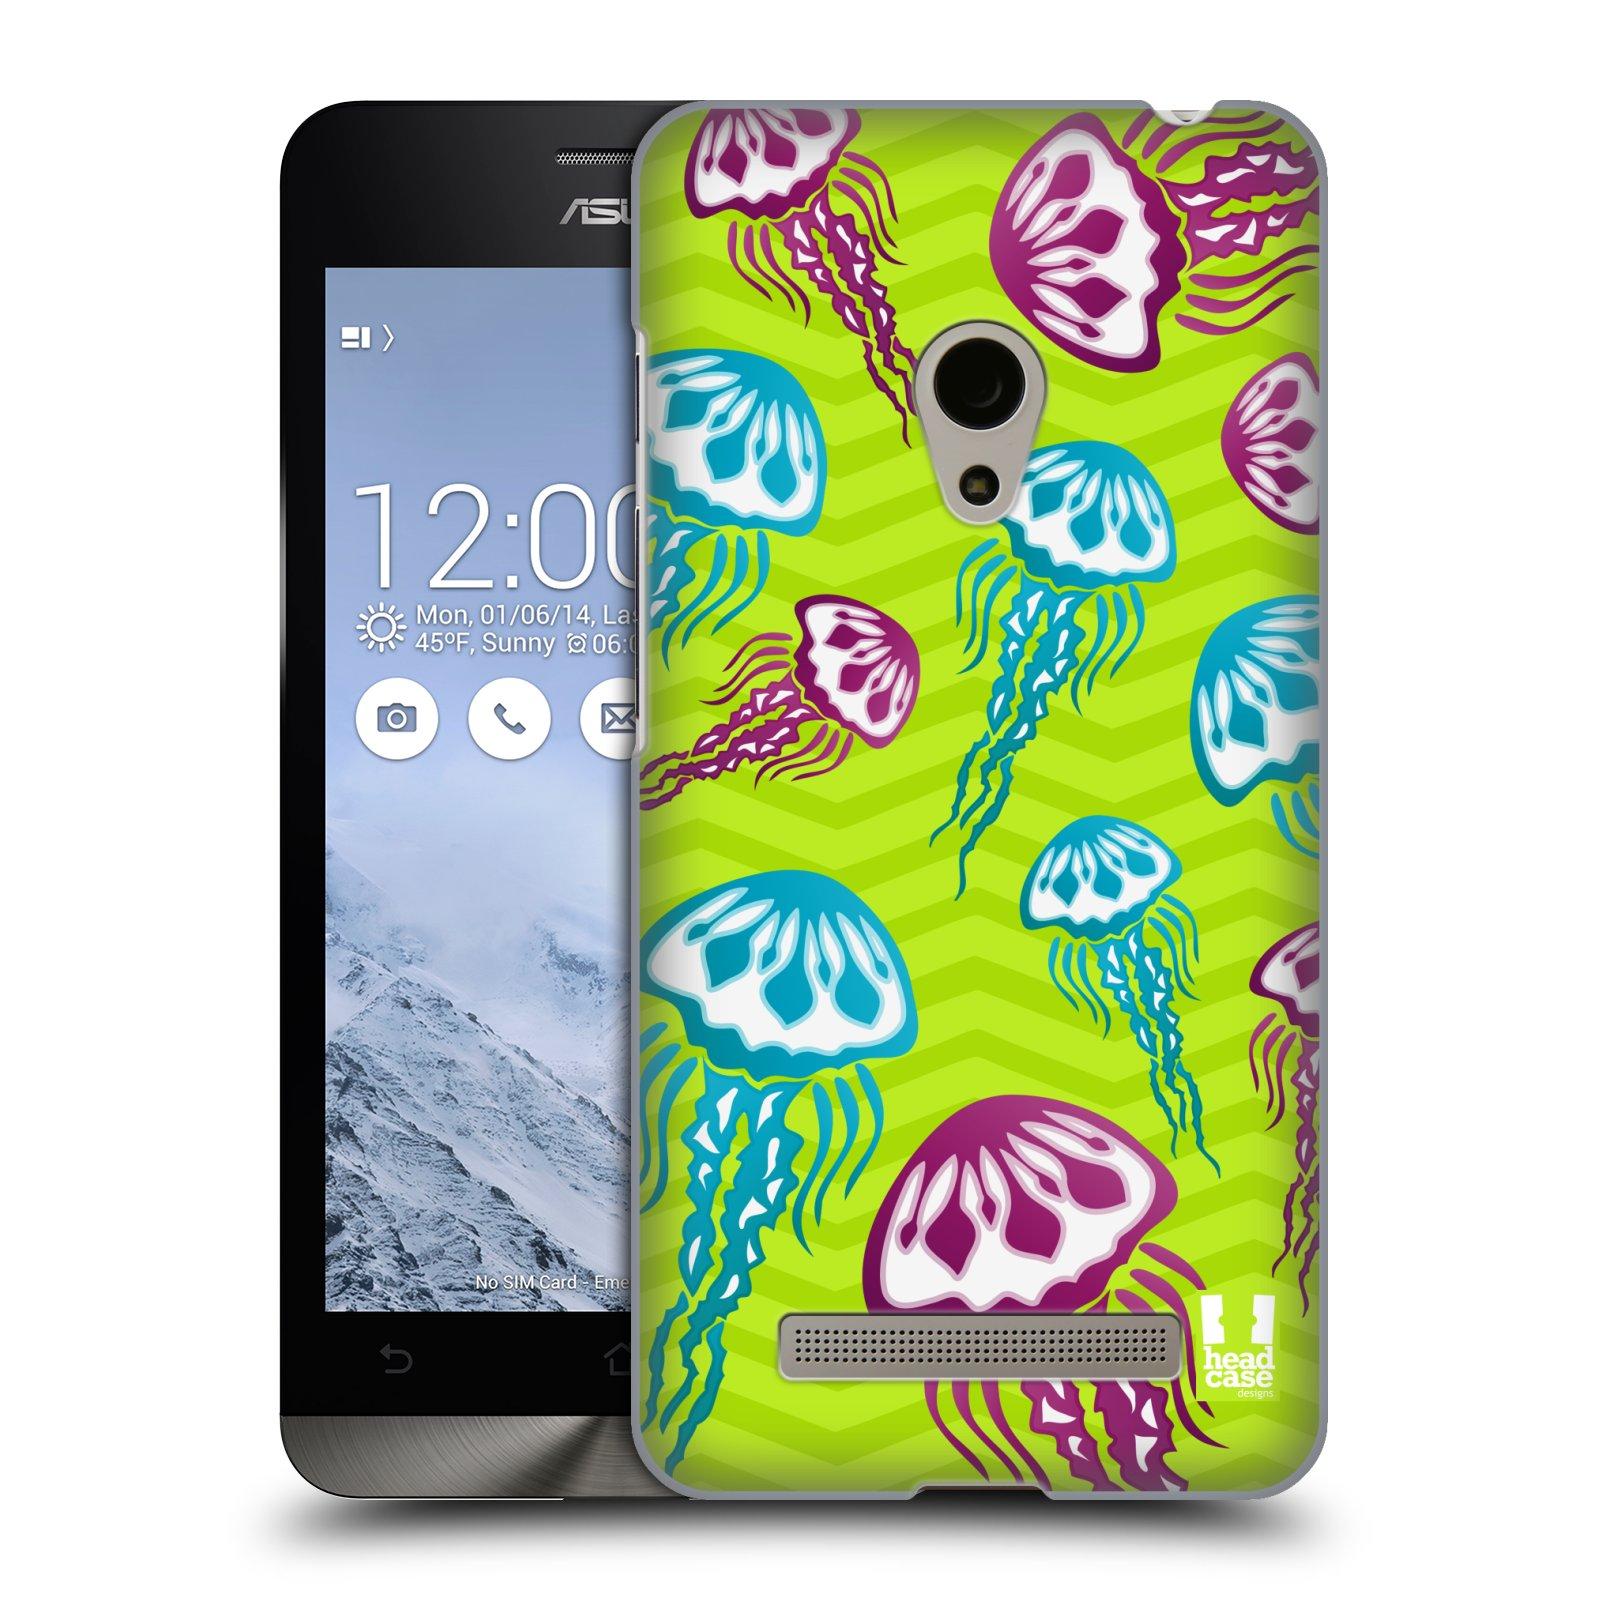 HEAD CASE plastový obal na mobil Asus Zenfone 5 vzor mořský živočich medůza